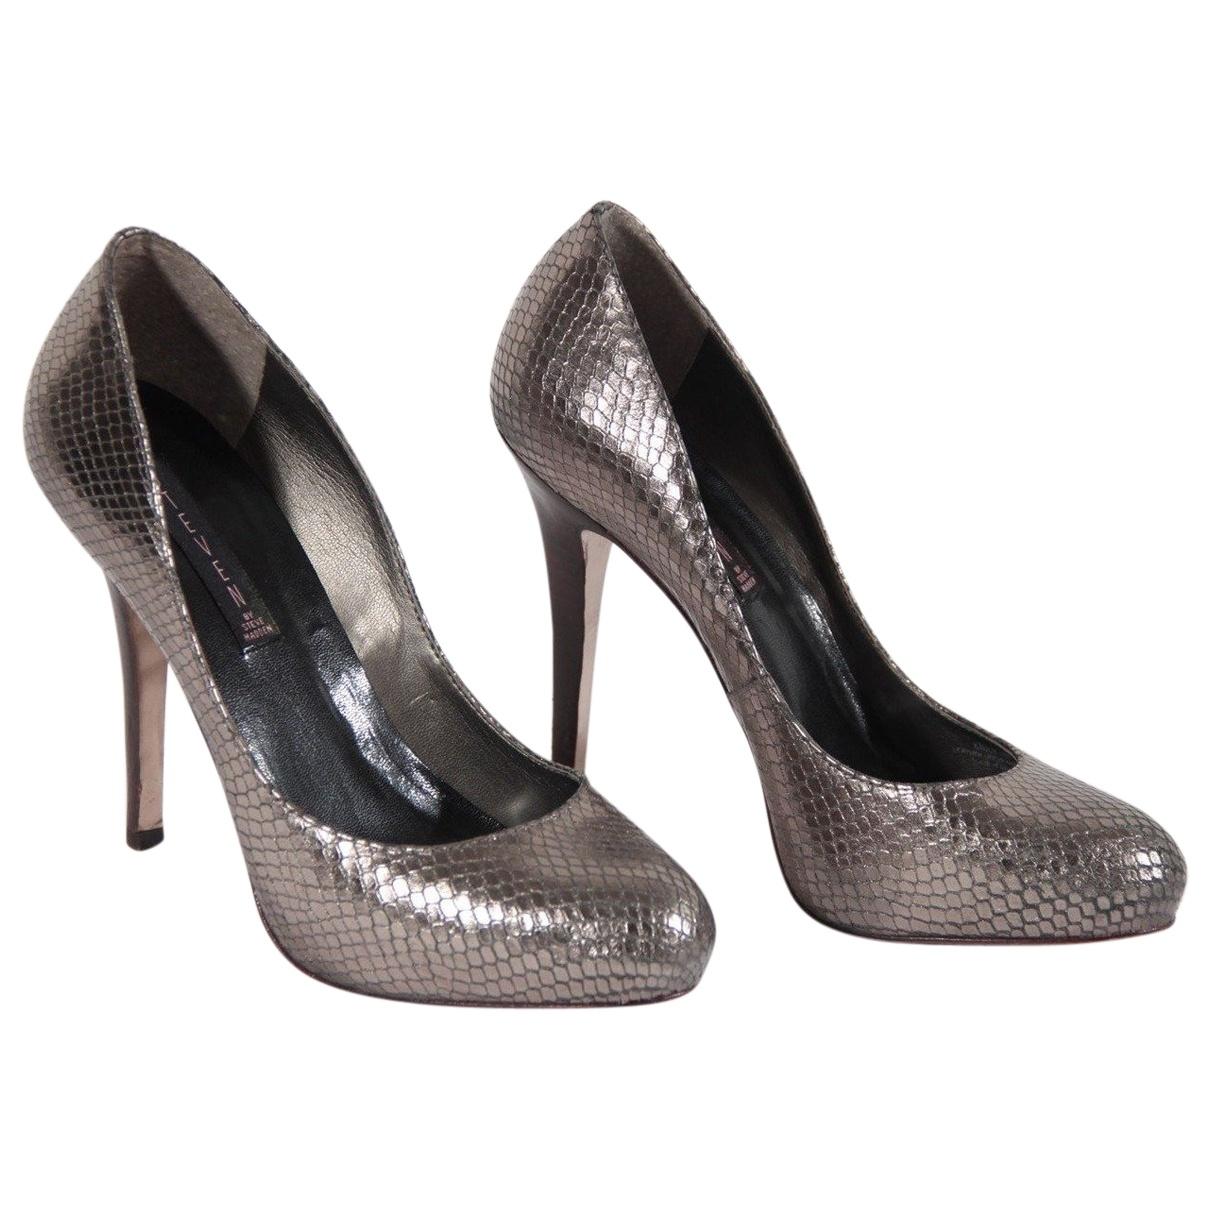 Steve Madden \N Silver Leather Heels for Women 39 EU